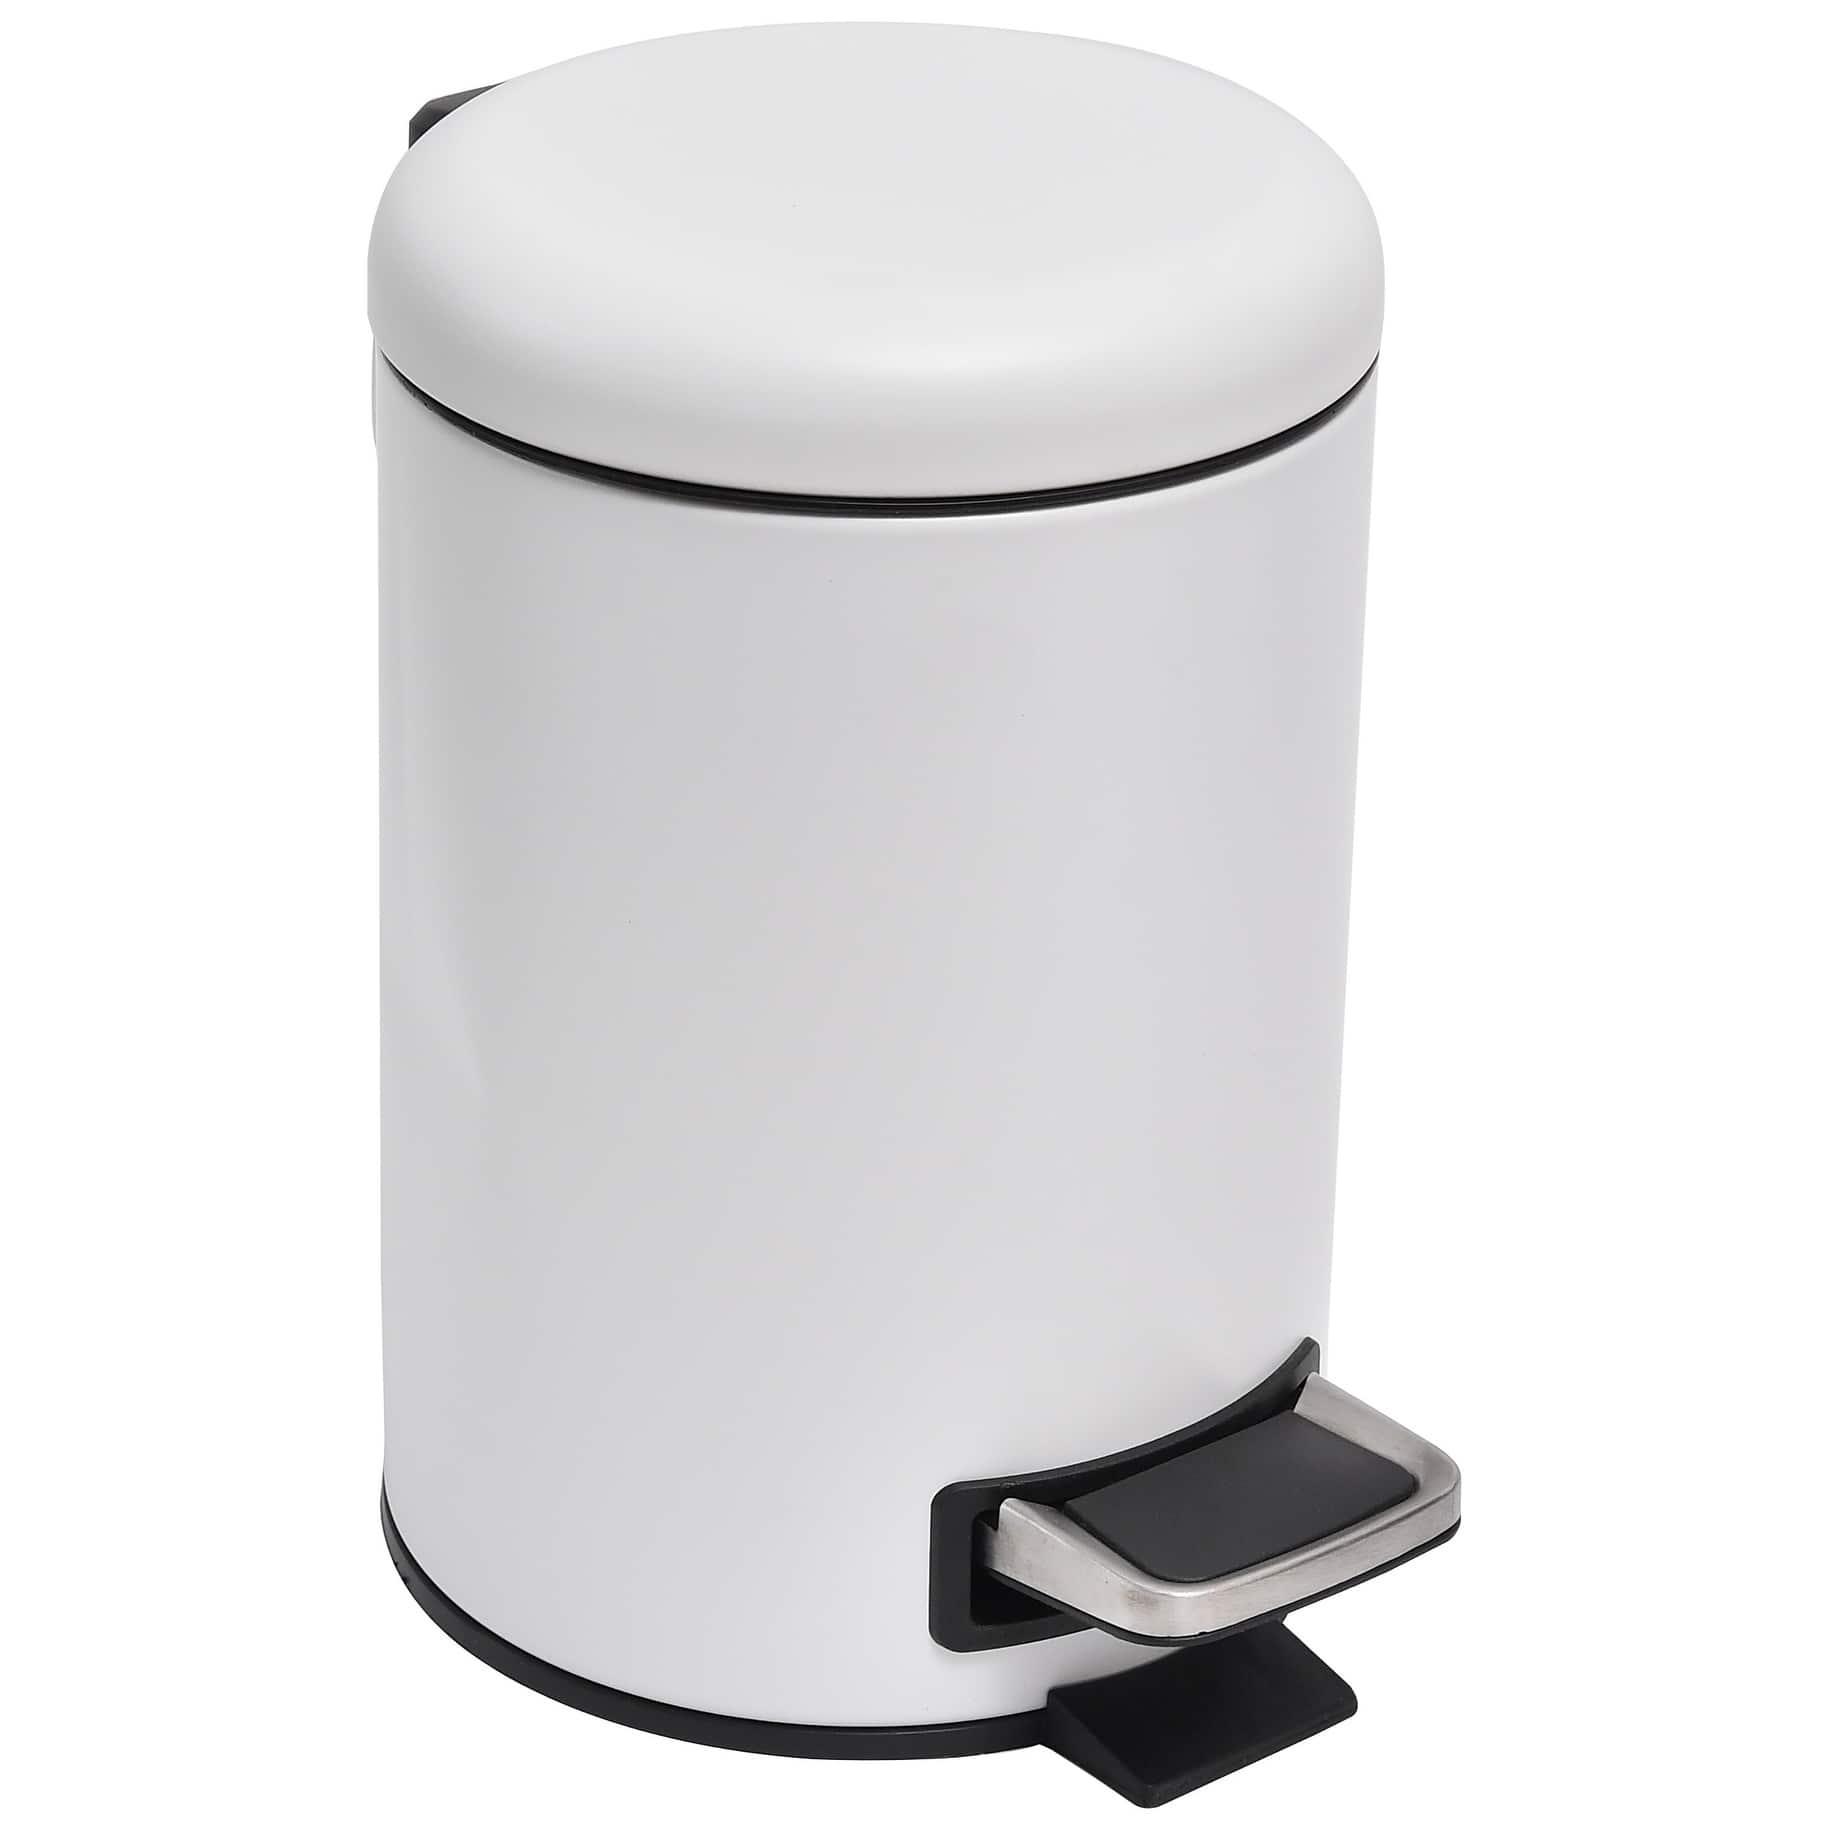 buy trash cans waste baskets online at overstock our best bathroom accessories deals. Black Bedroom Furniture Sets. Home Design Ideas